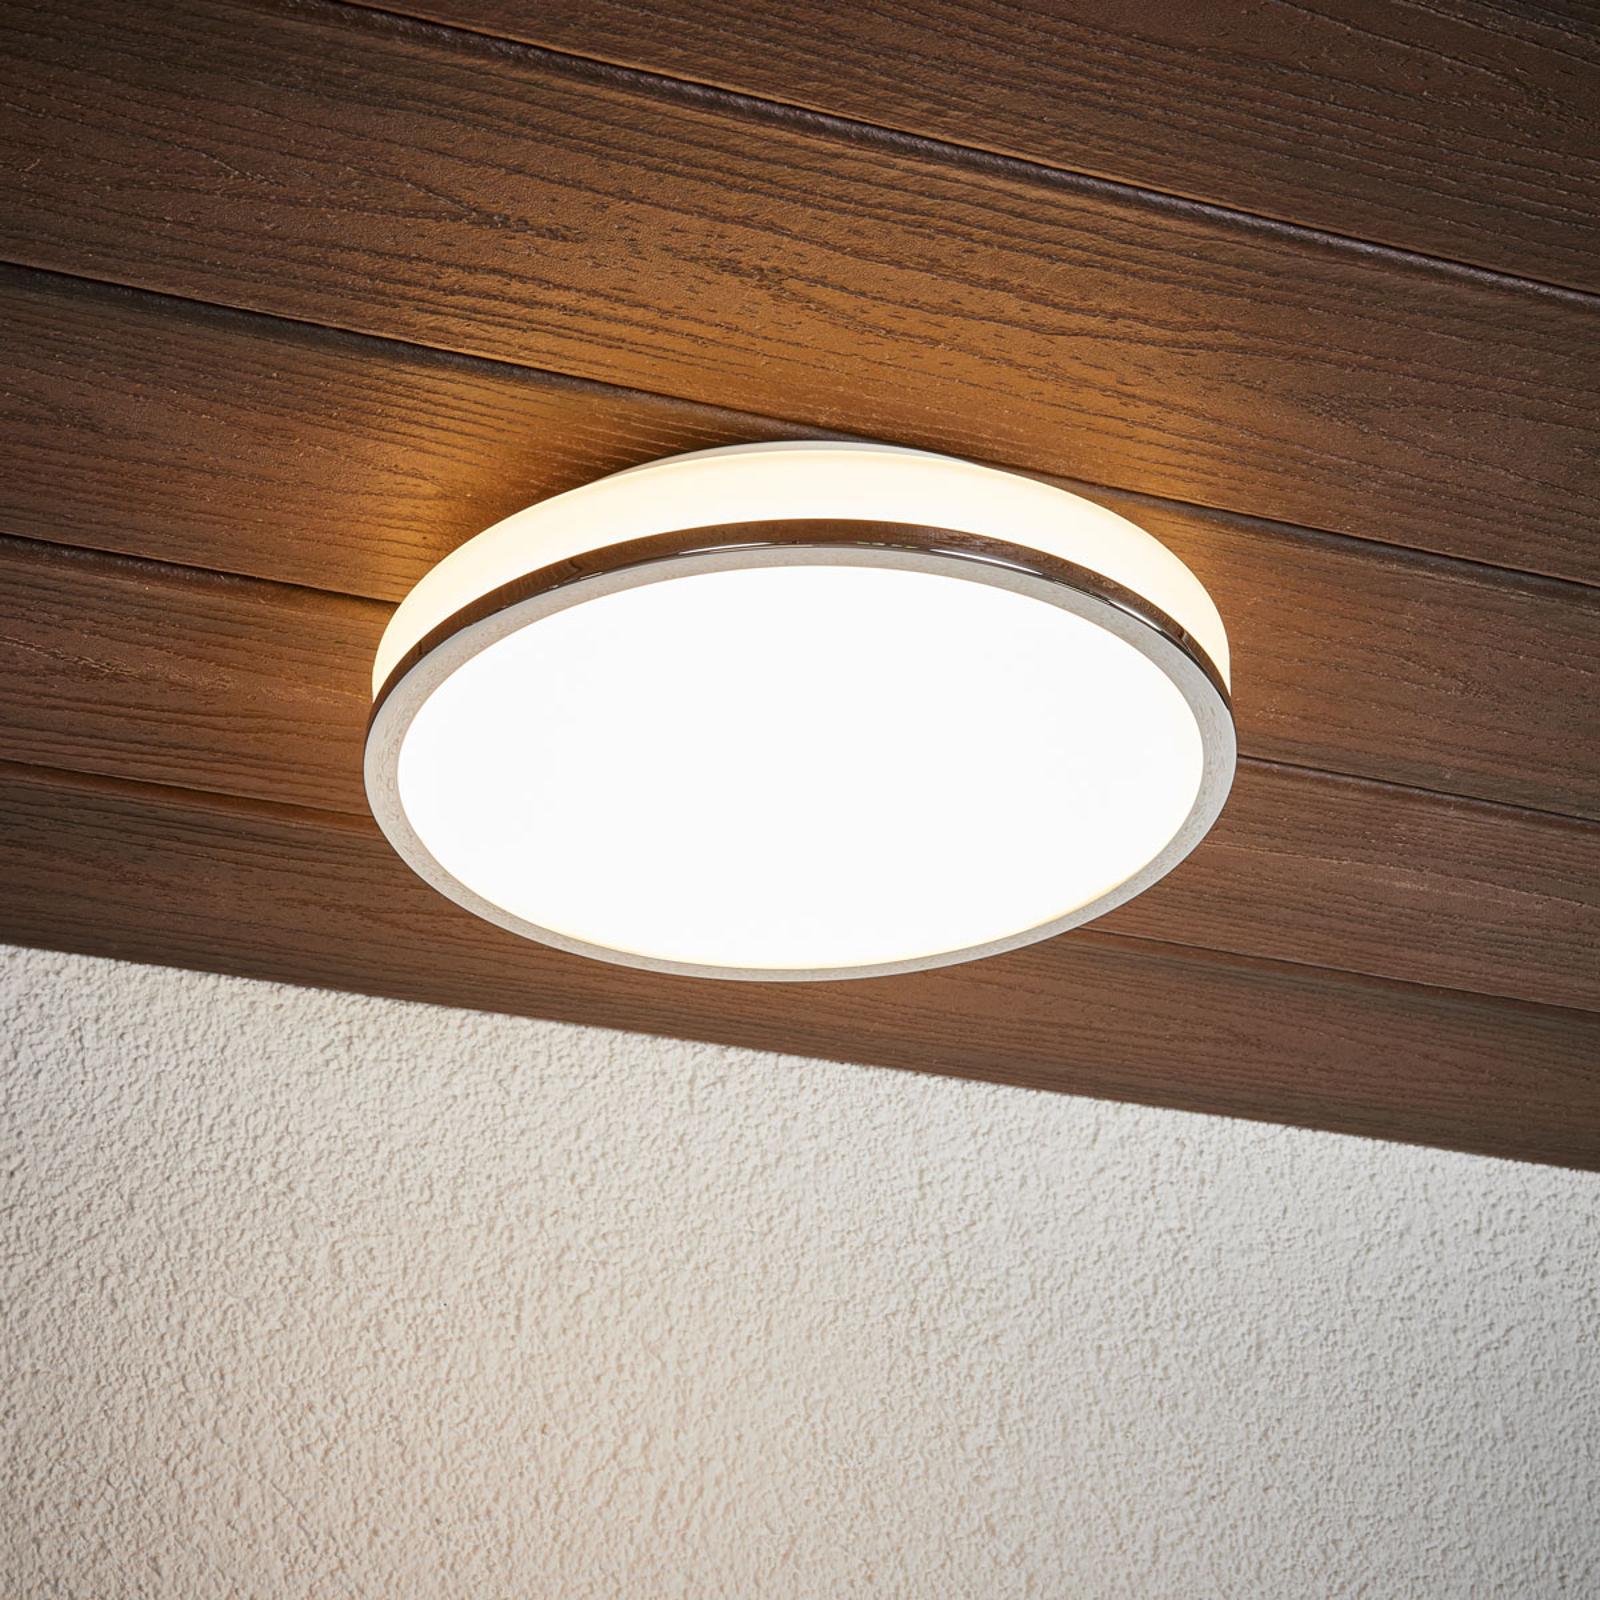 Ronde LED plafondlamp Lyss met chromen rand, IP44